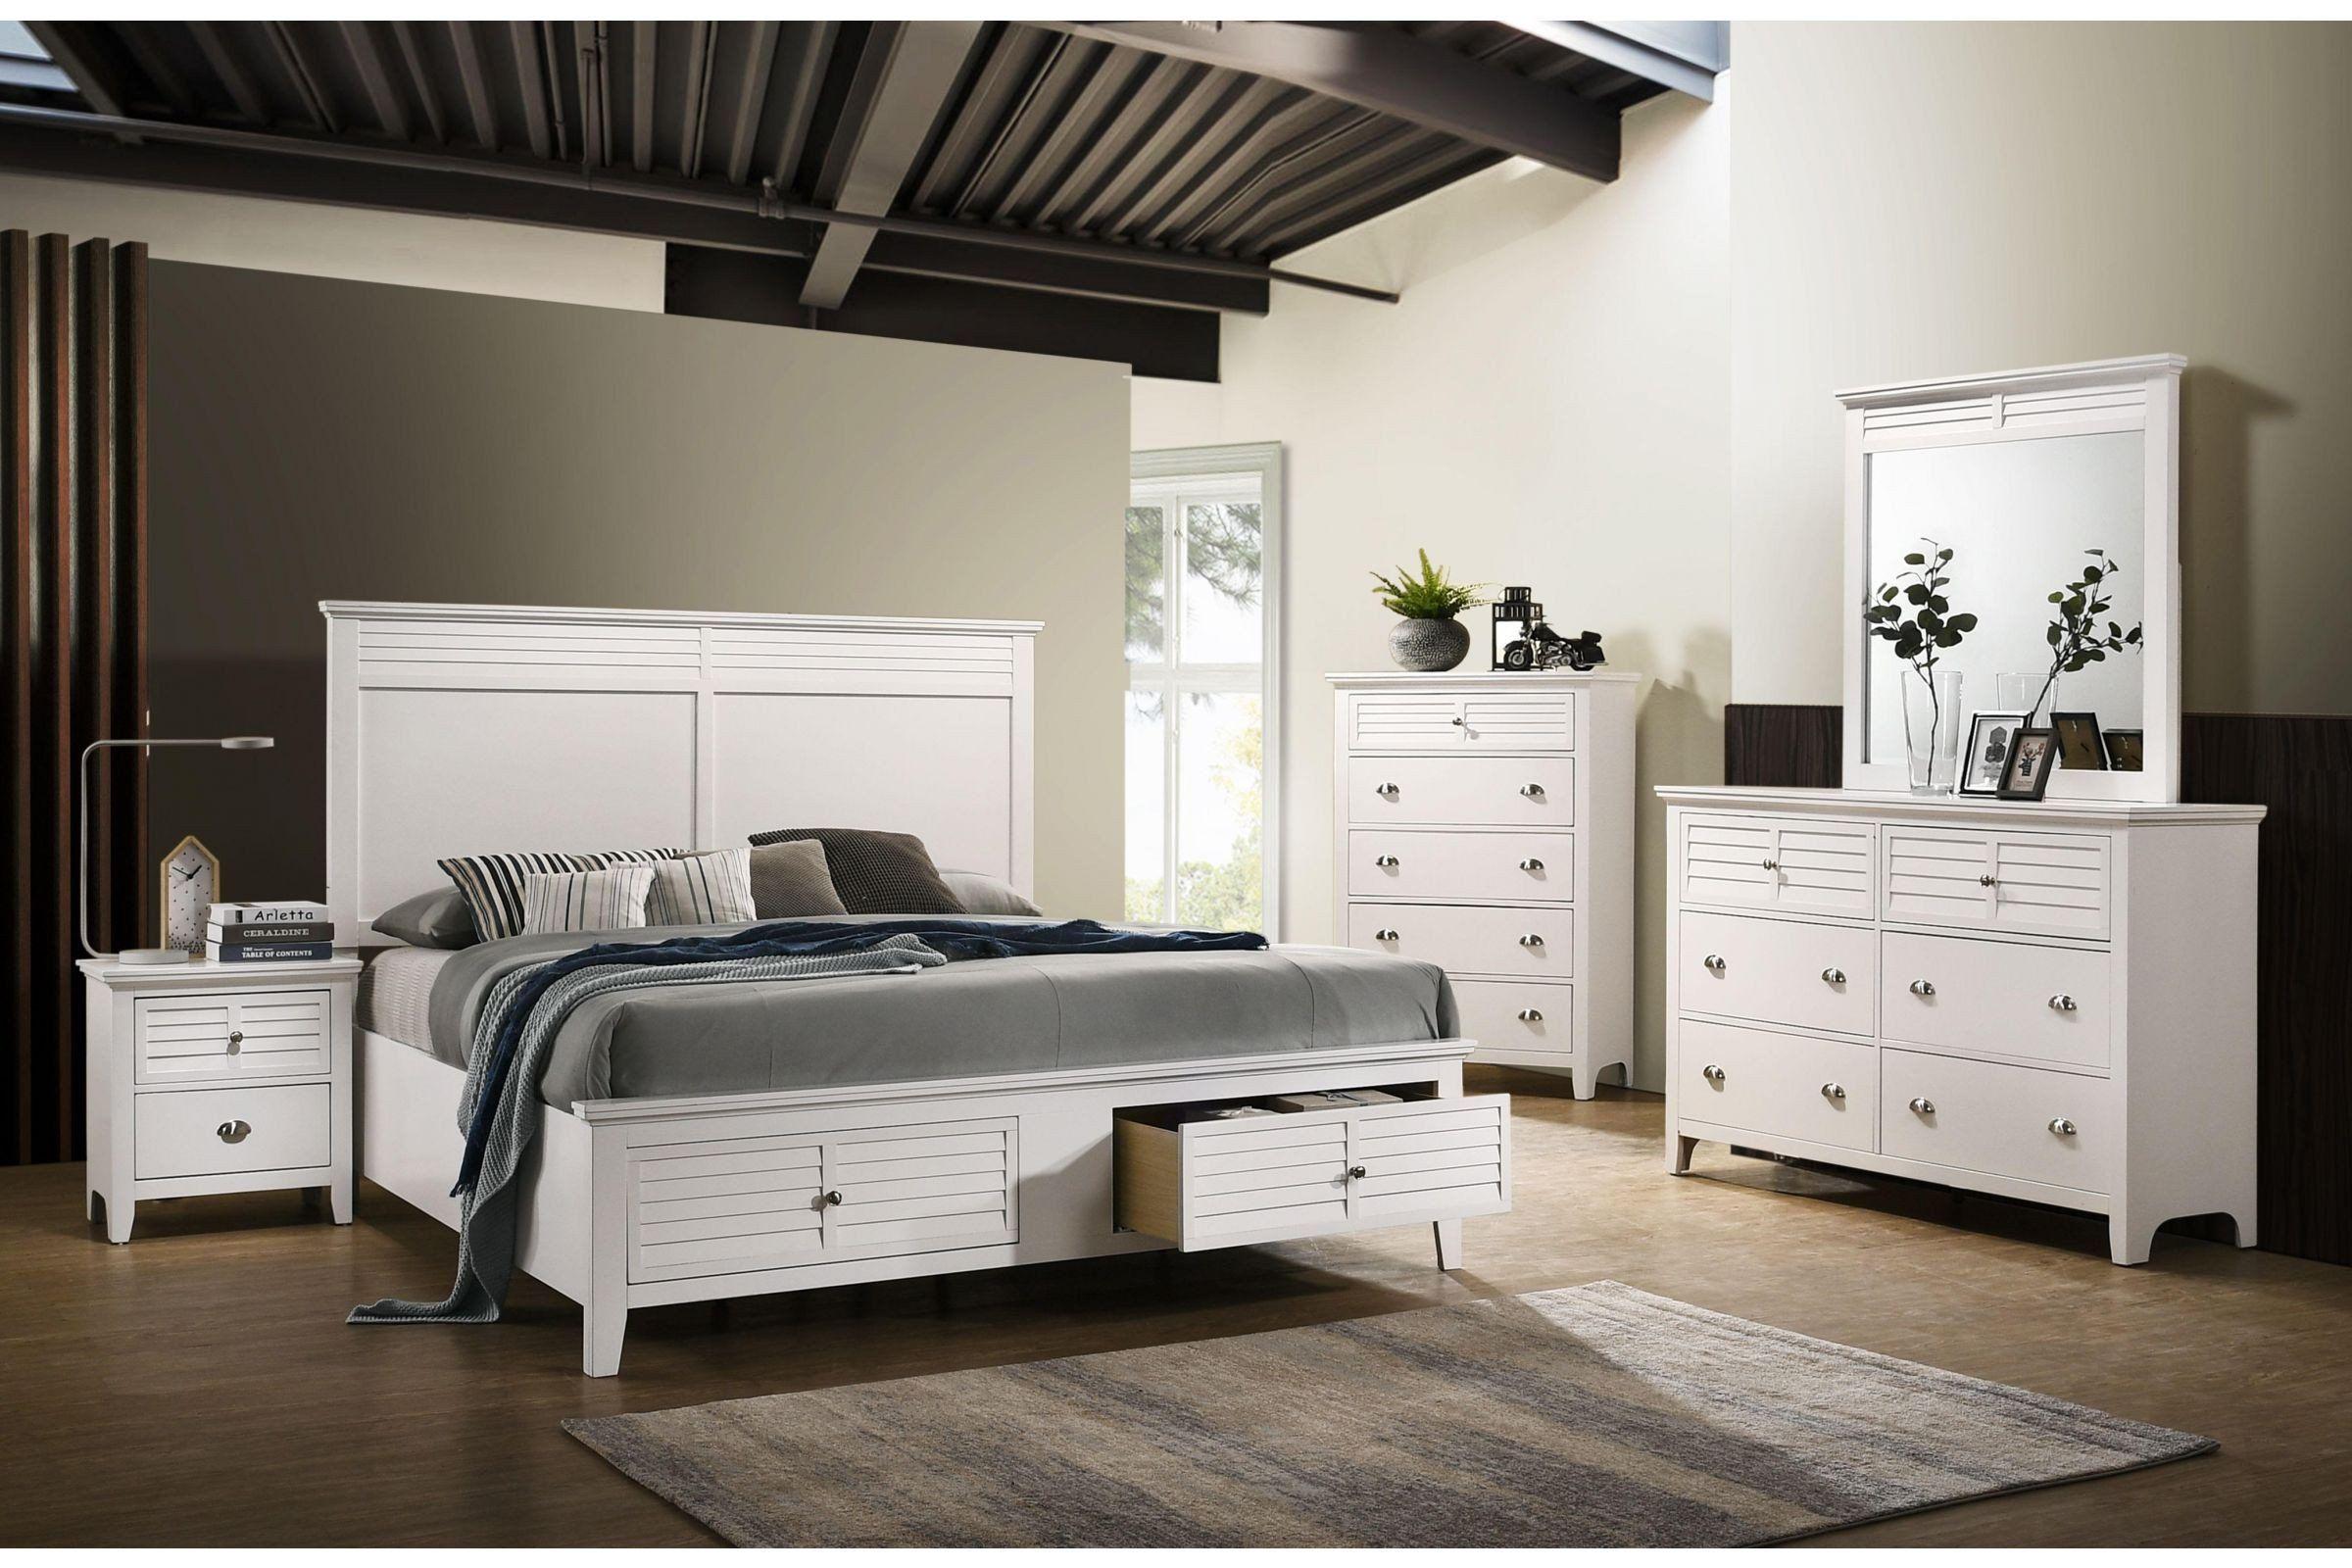 Pin On Best Bedroom Set Design